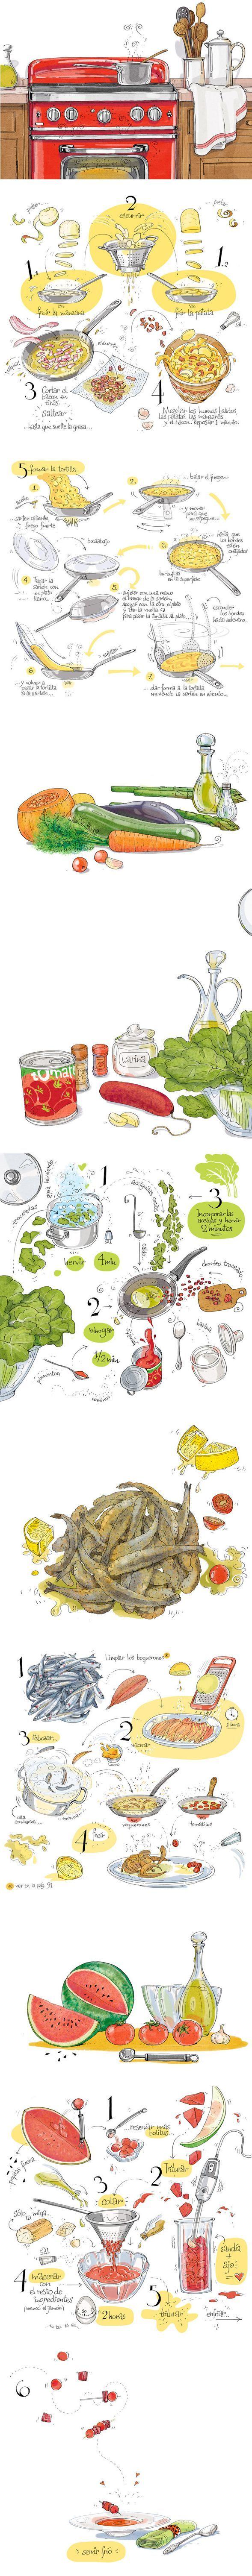 The Drawn Recipes Cookbook